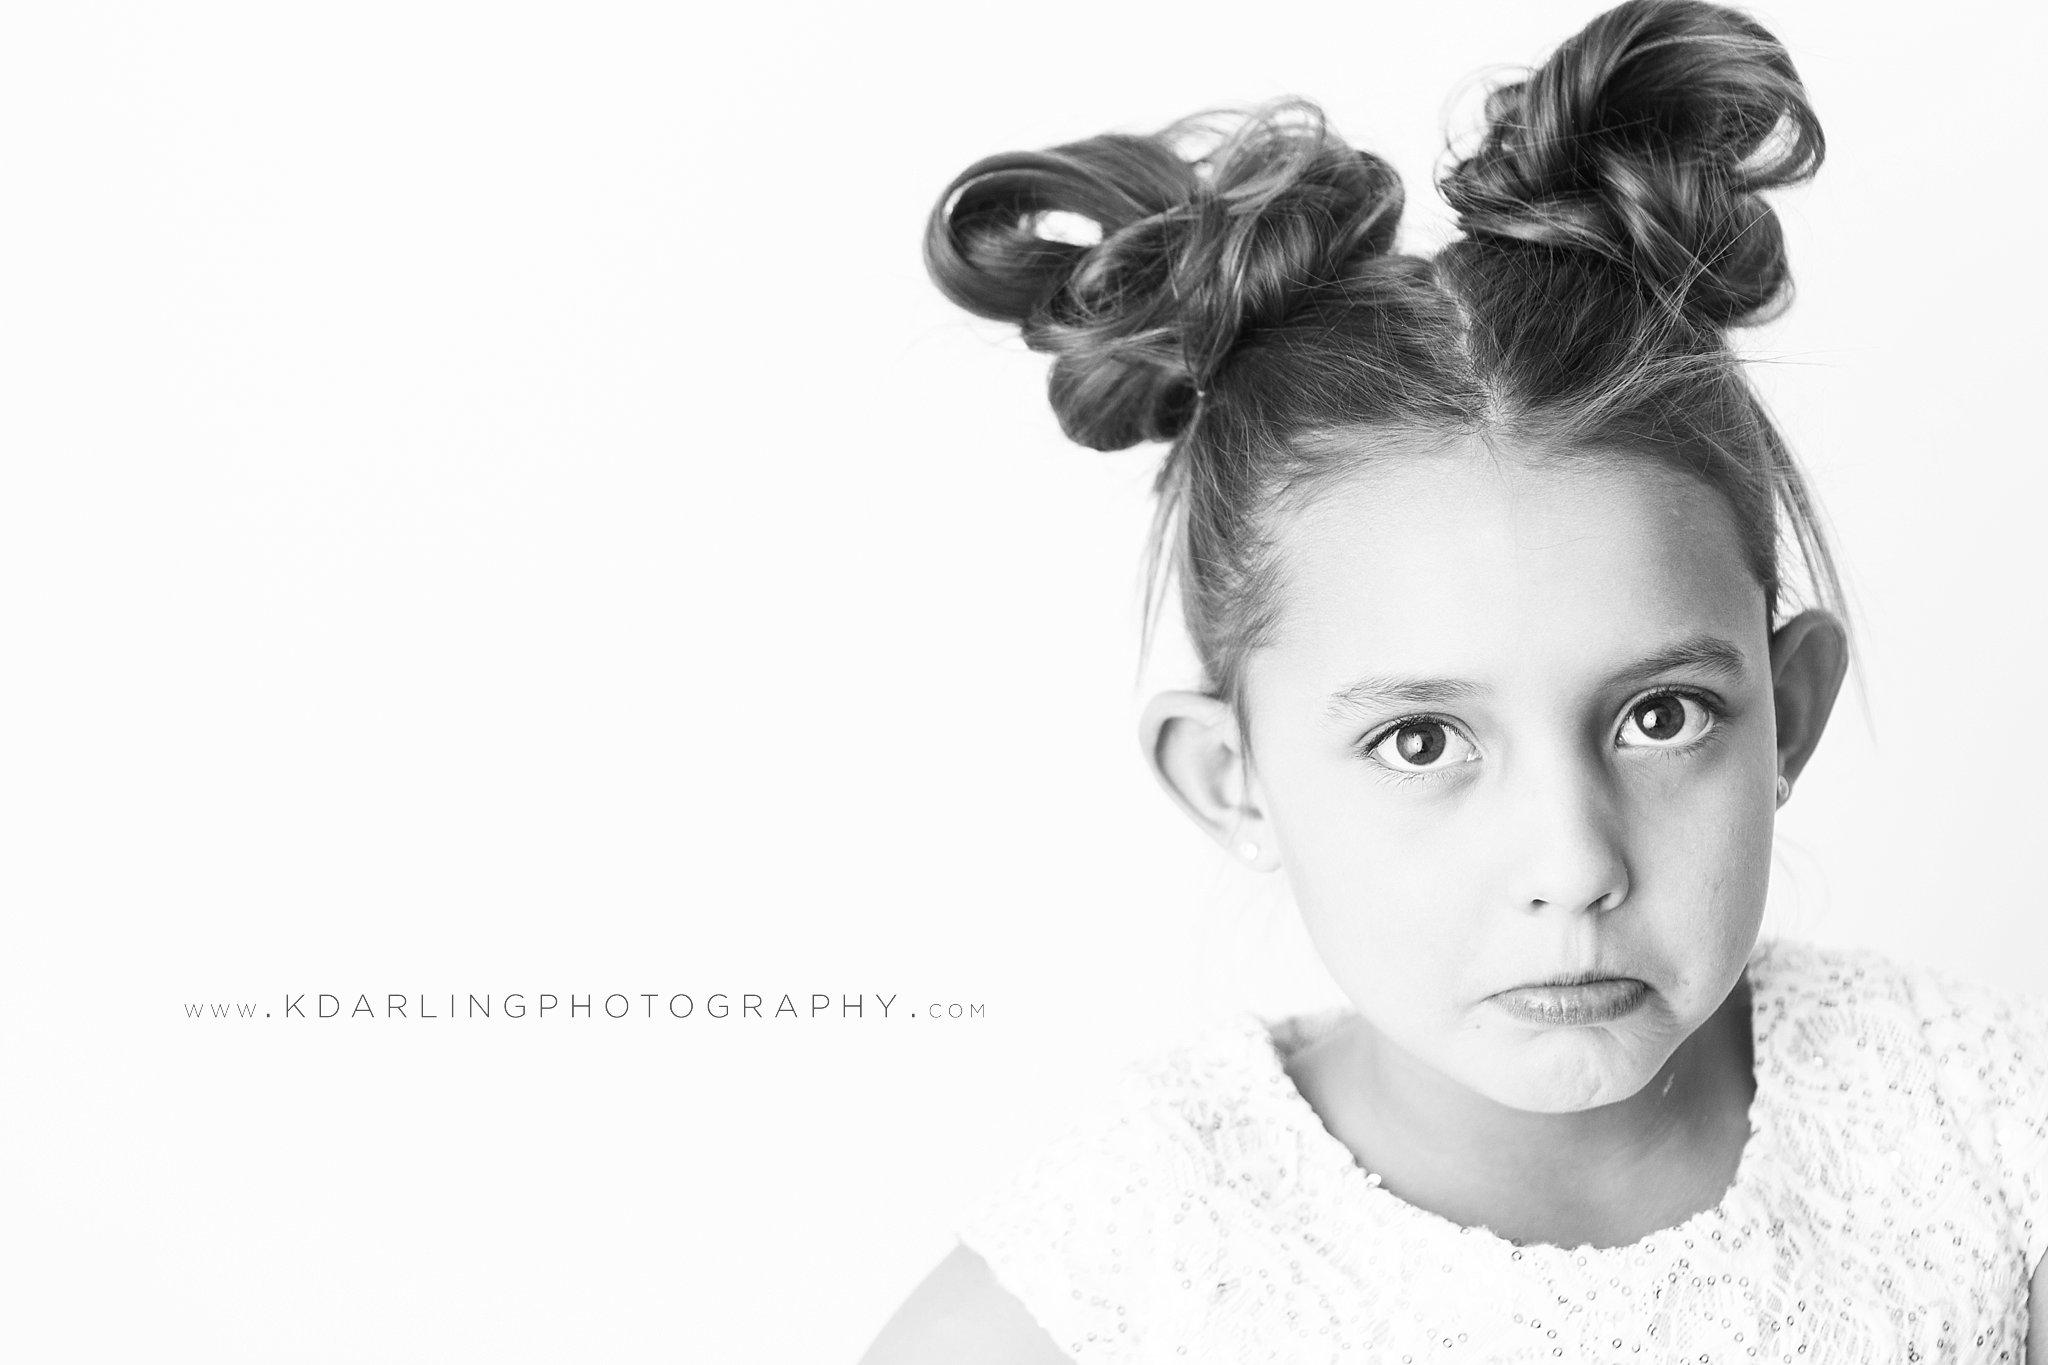 Child-Photographer-portraits-Champaign-County-IL-Fisher-Studio-Darling_0184.jpg